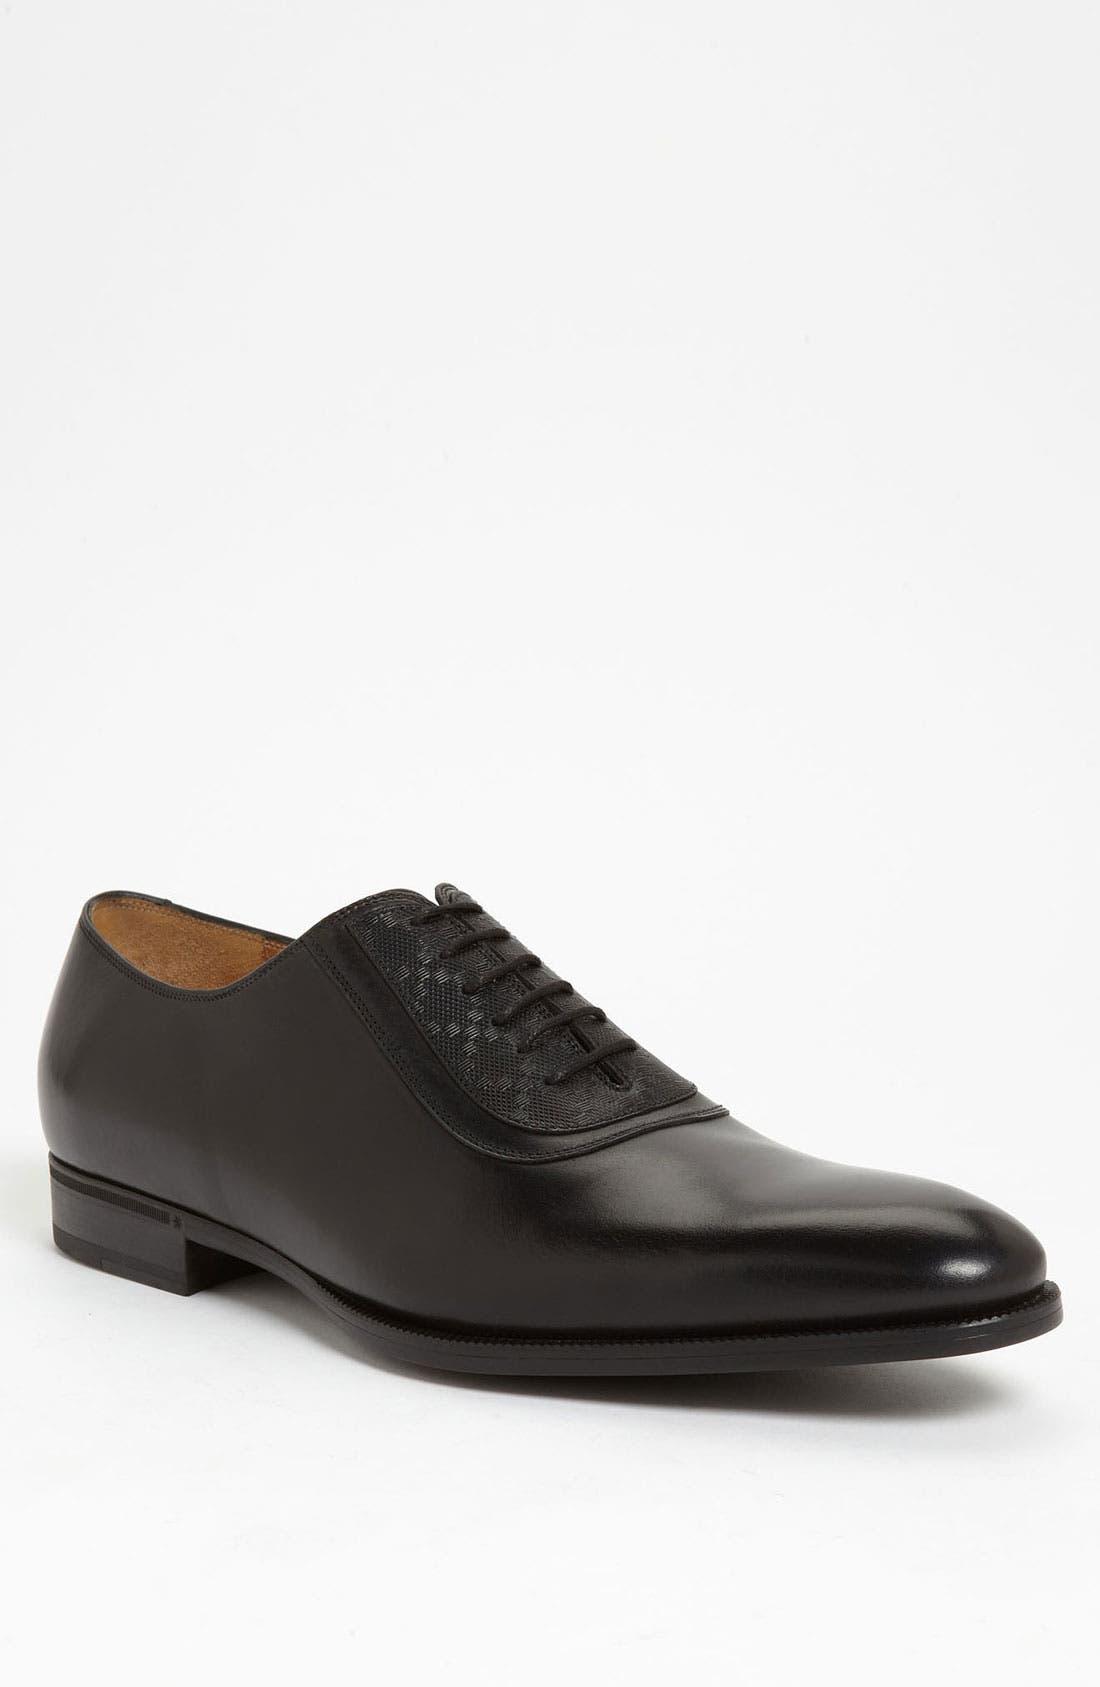 Alternate Image 1 Selected - Gucci 'Noort' Plain Toe Oxford